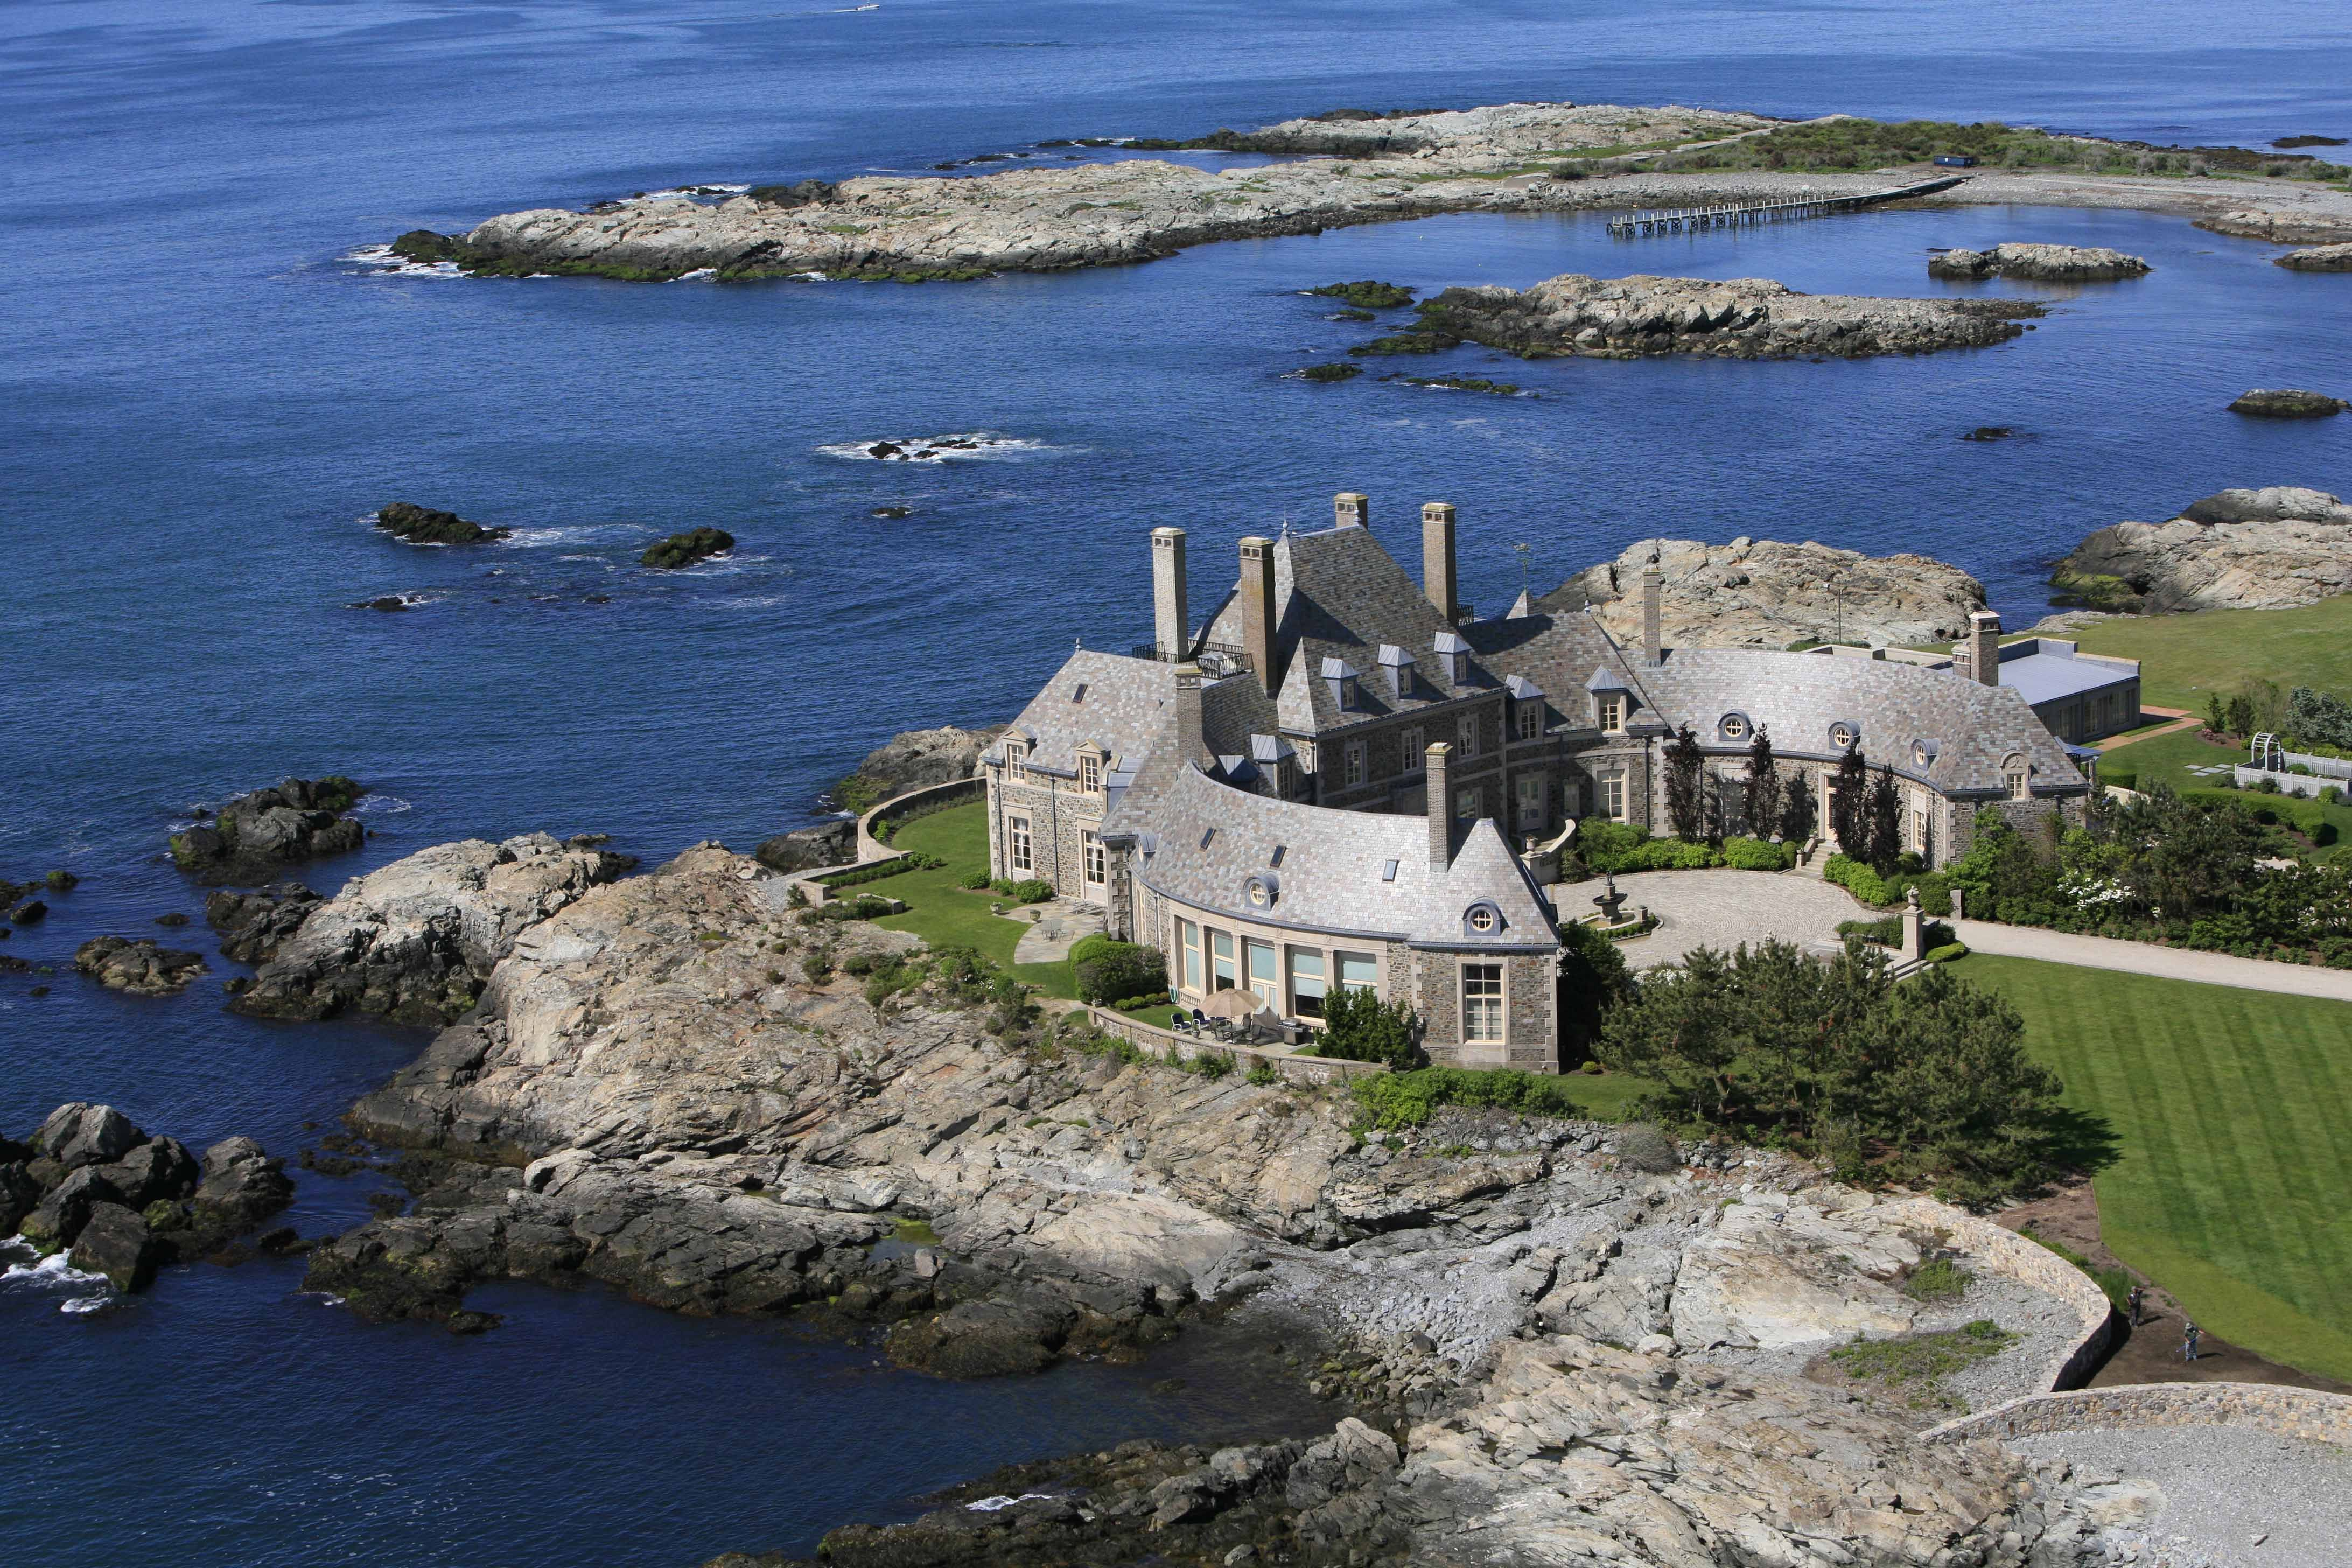 Jay Leno Newport Rhode Island Home Seafair